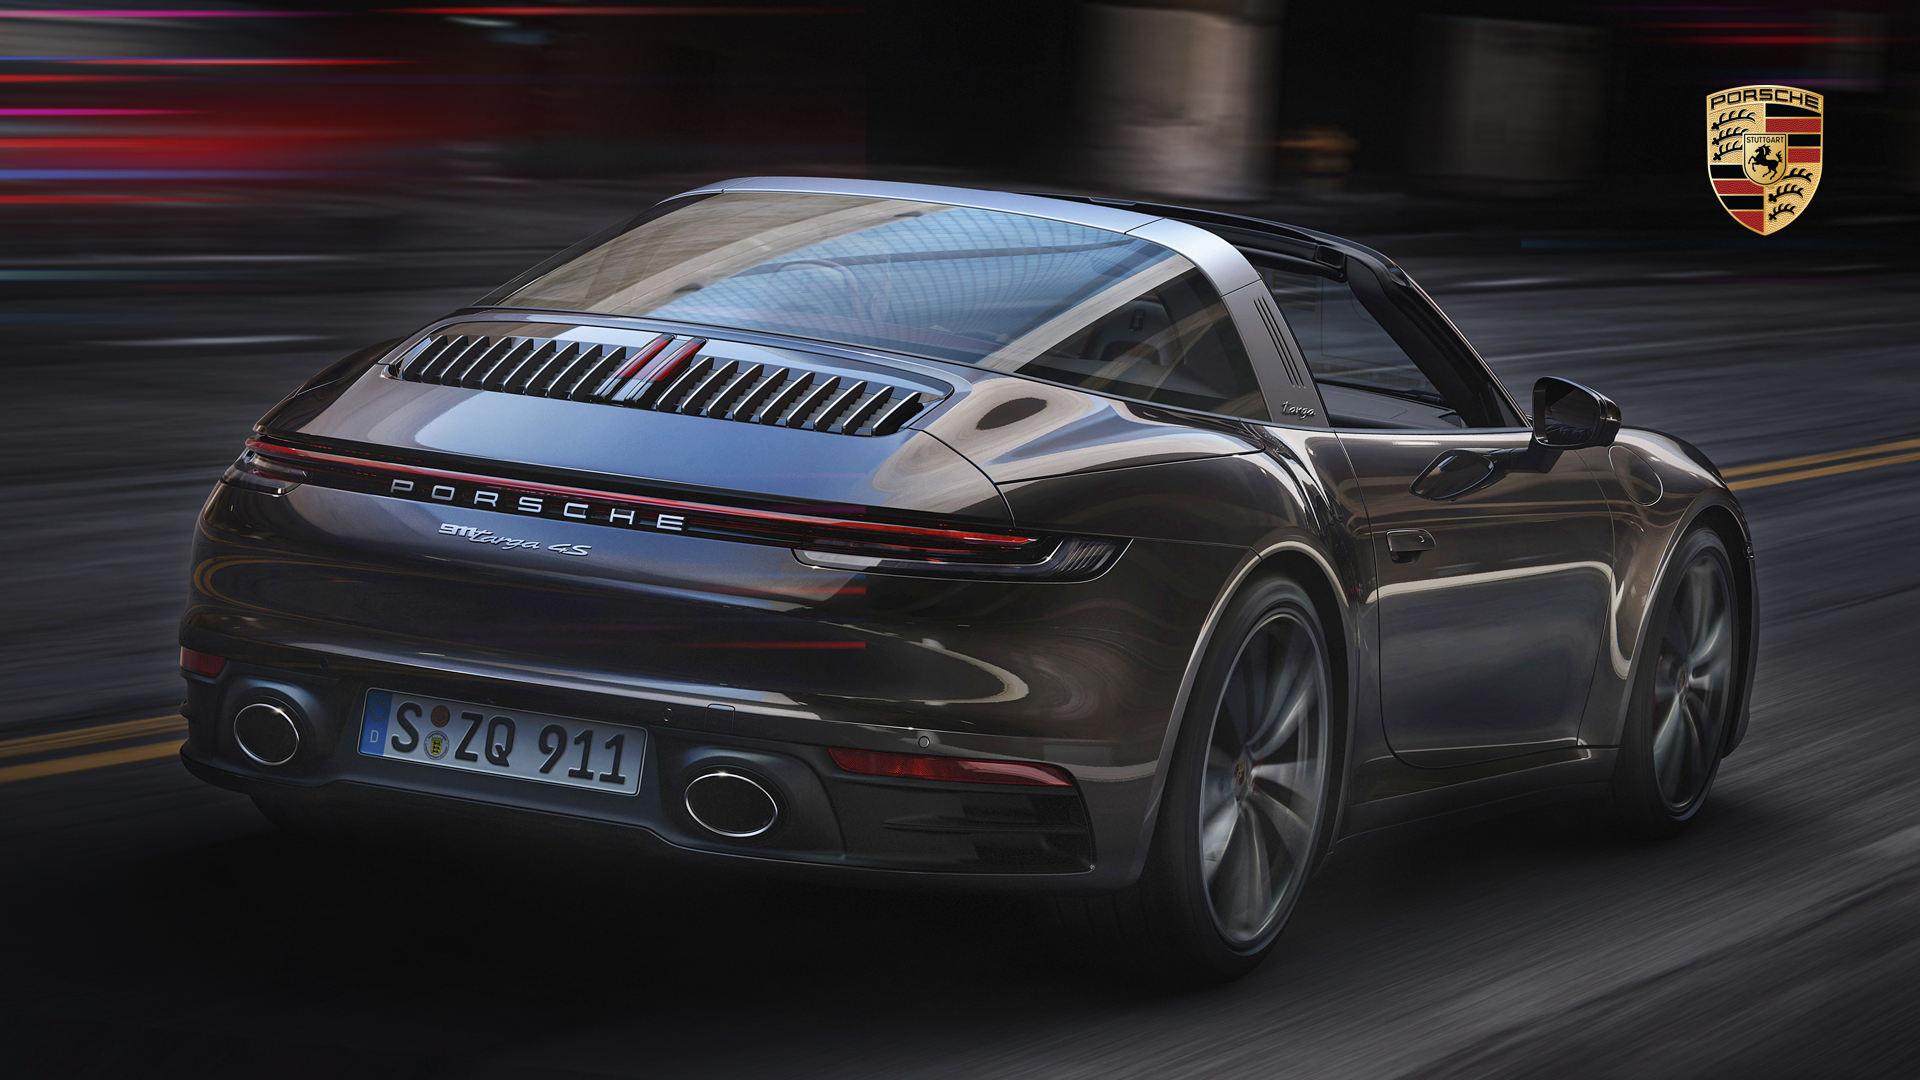 Porsche 911 Targa 4s Wallpaper